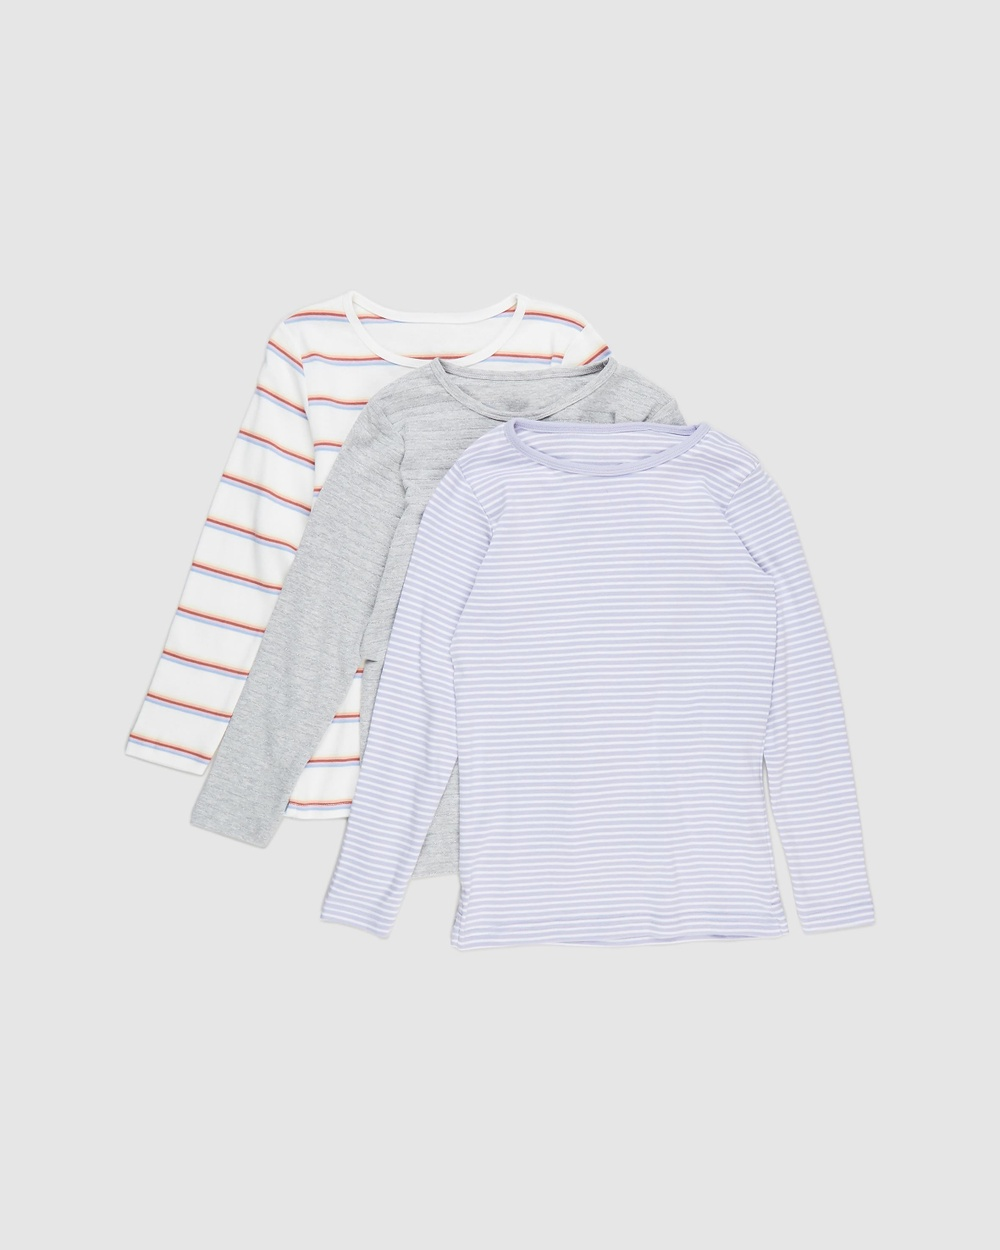 Cotton On Kids - Jessie Crew 3 Pack   Kids Teens - T-Shirts & Singlets (Grey Stripe, Lilac Stripe & Vanilla Rainbow) Jessie Crew 3-Pack - Kids-Teens